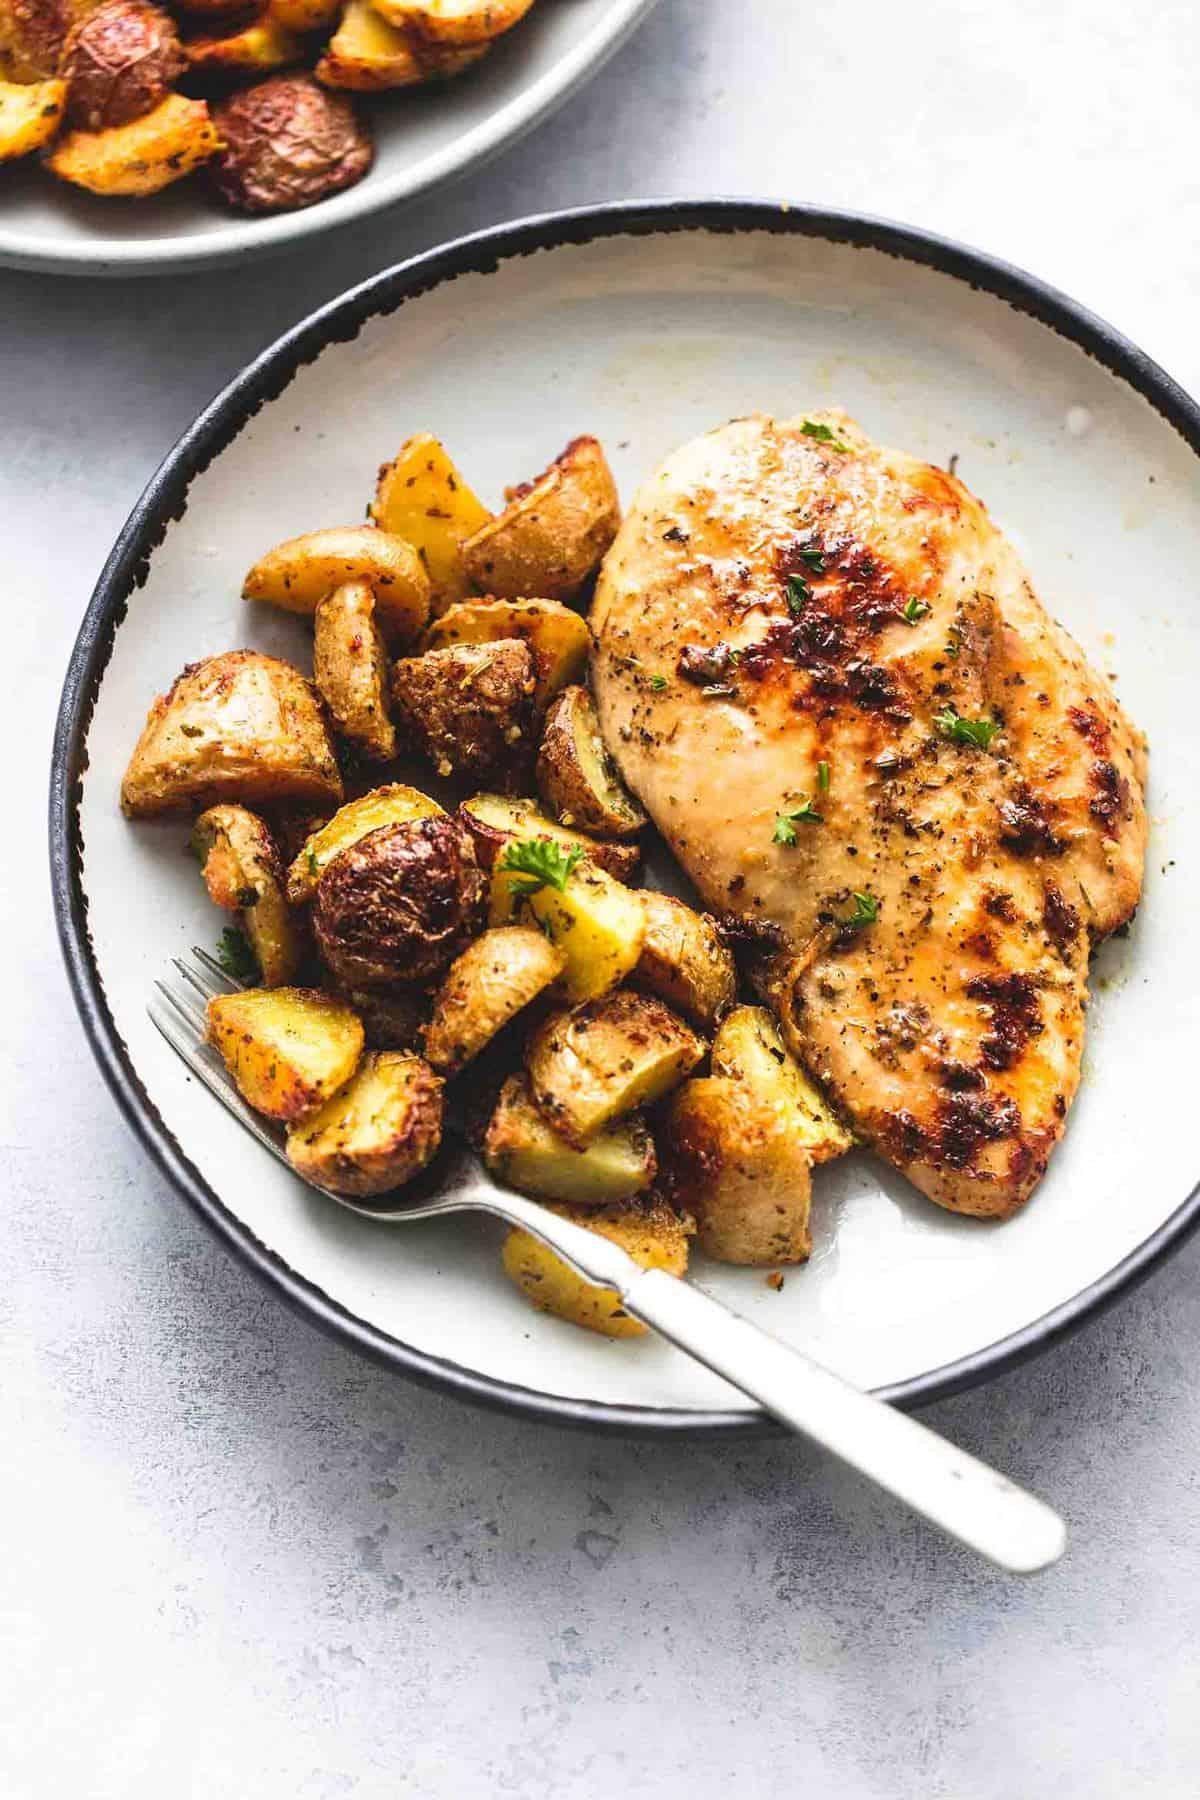 Easy Sheet Pan Chicken and Potatoes (Five Ingredients) Dinner Recipe   lecremedelacrumb.com